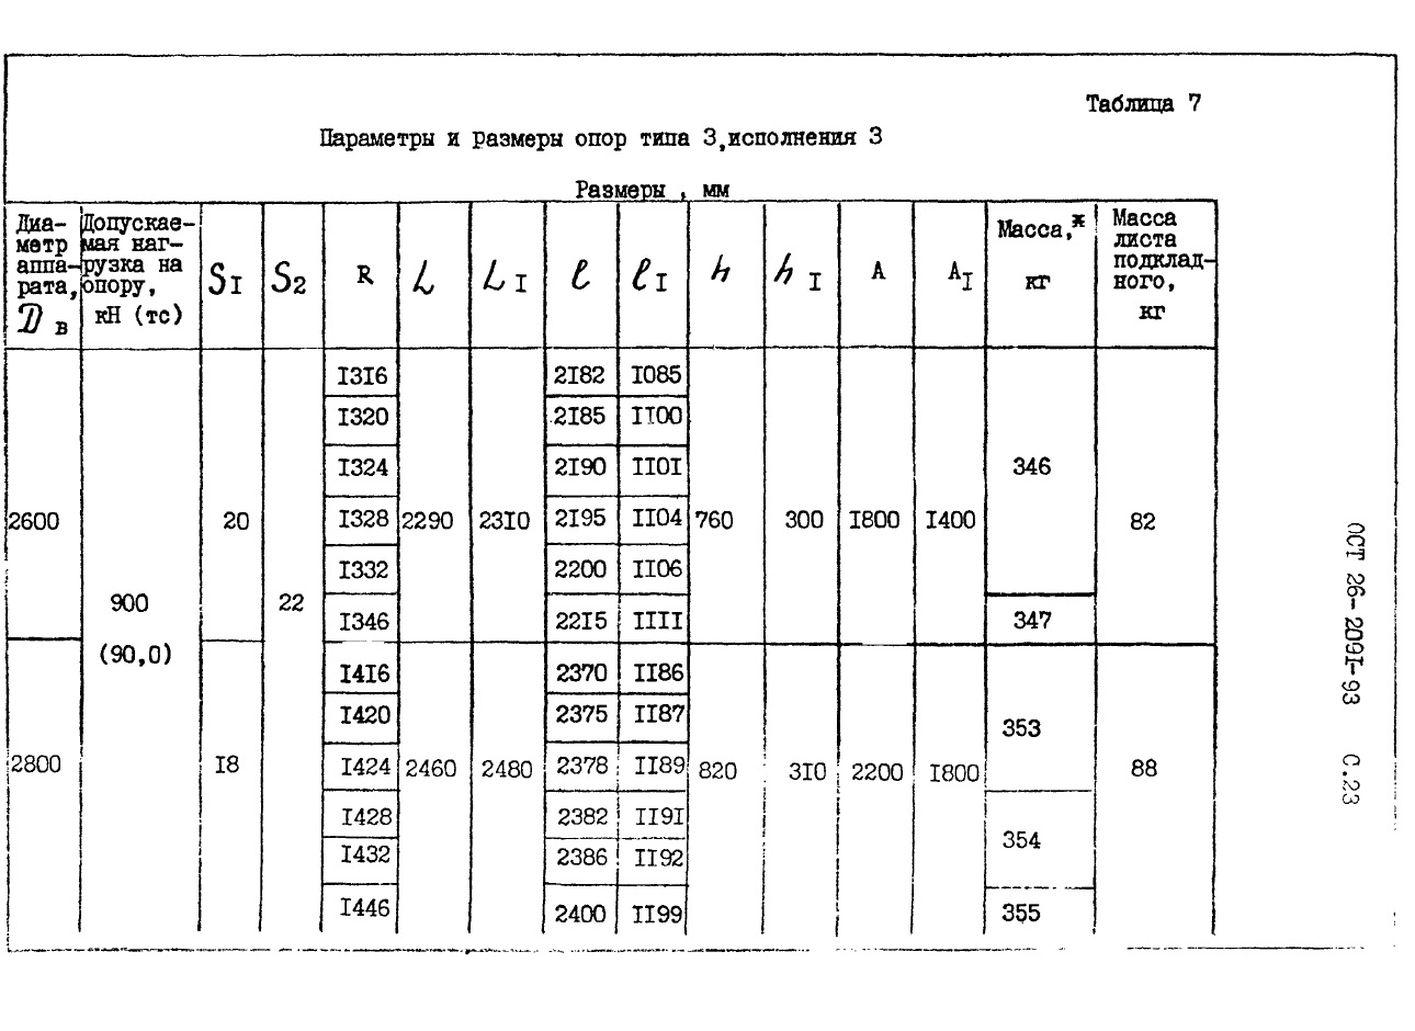 Опоры тип 3 ОСТ 26-2091-93 стр.6